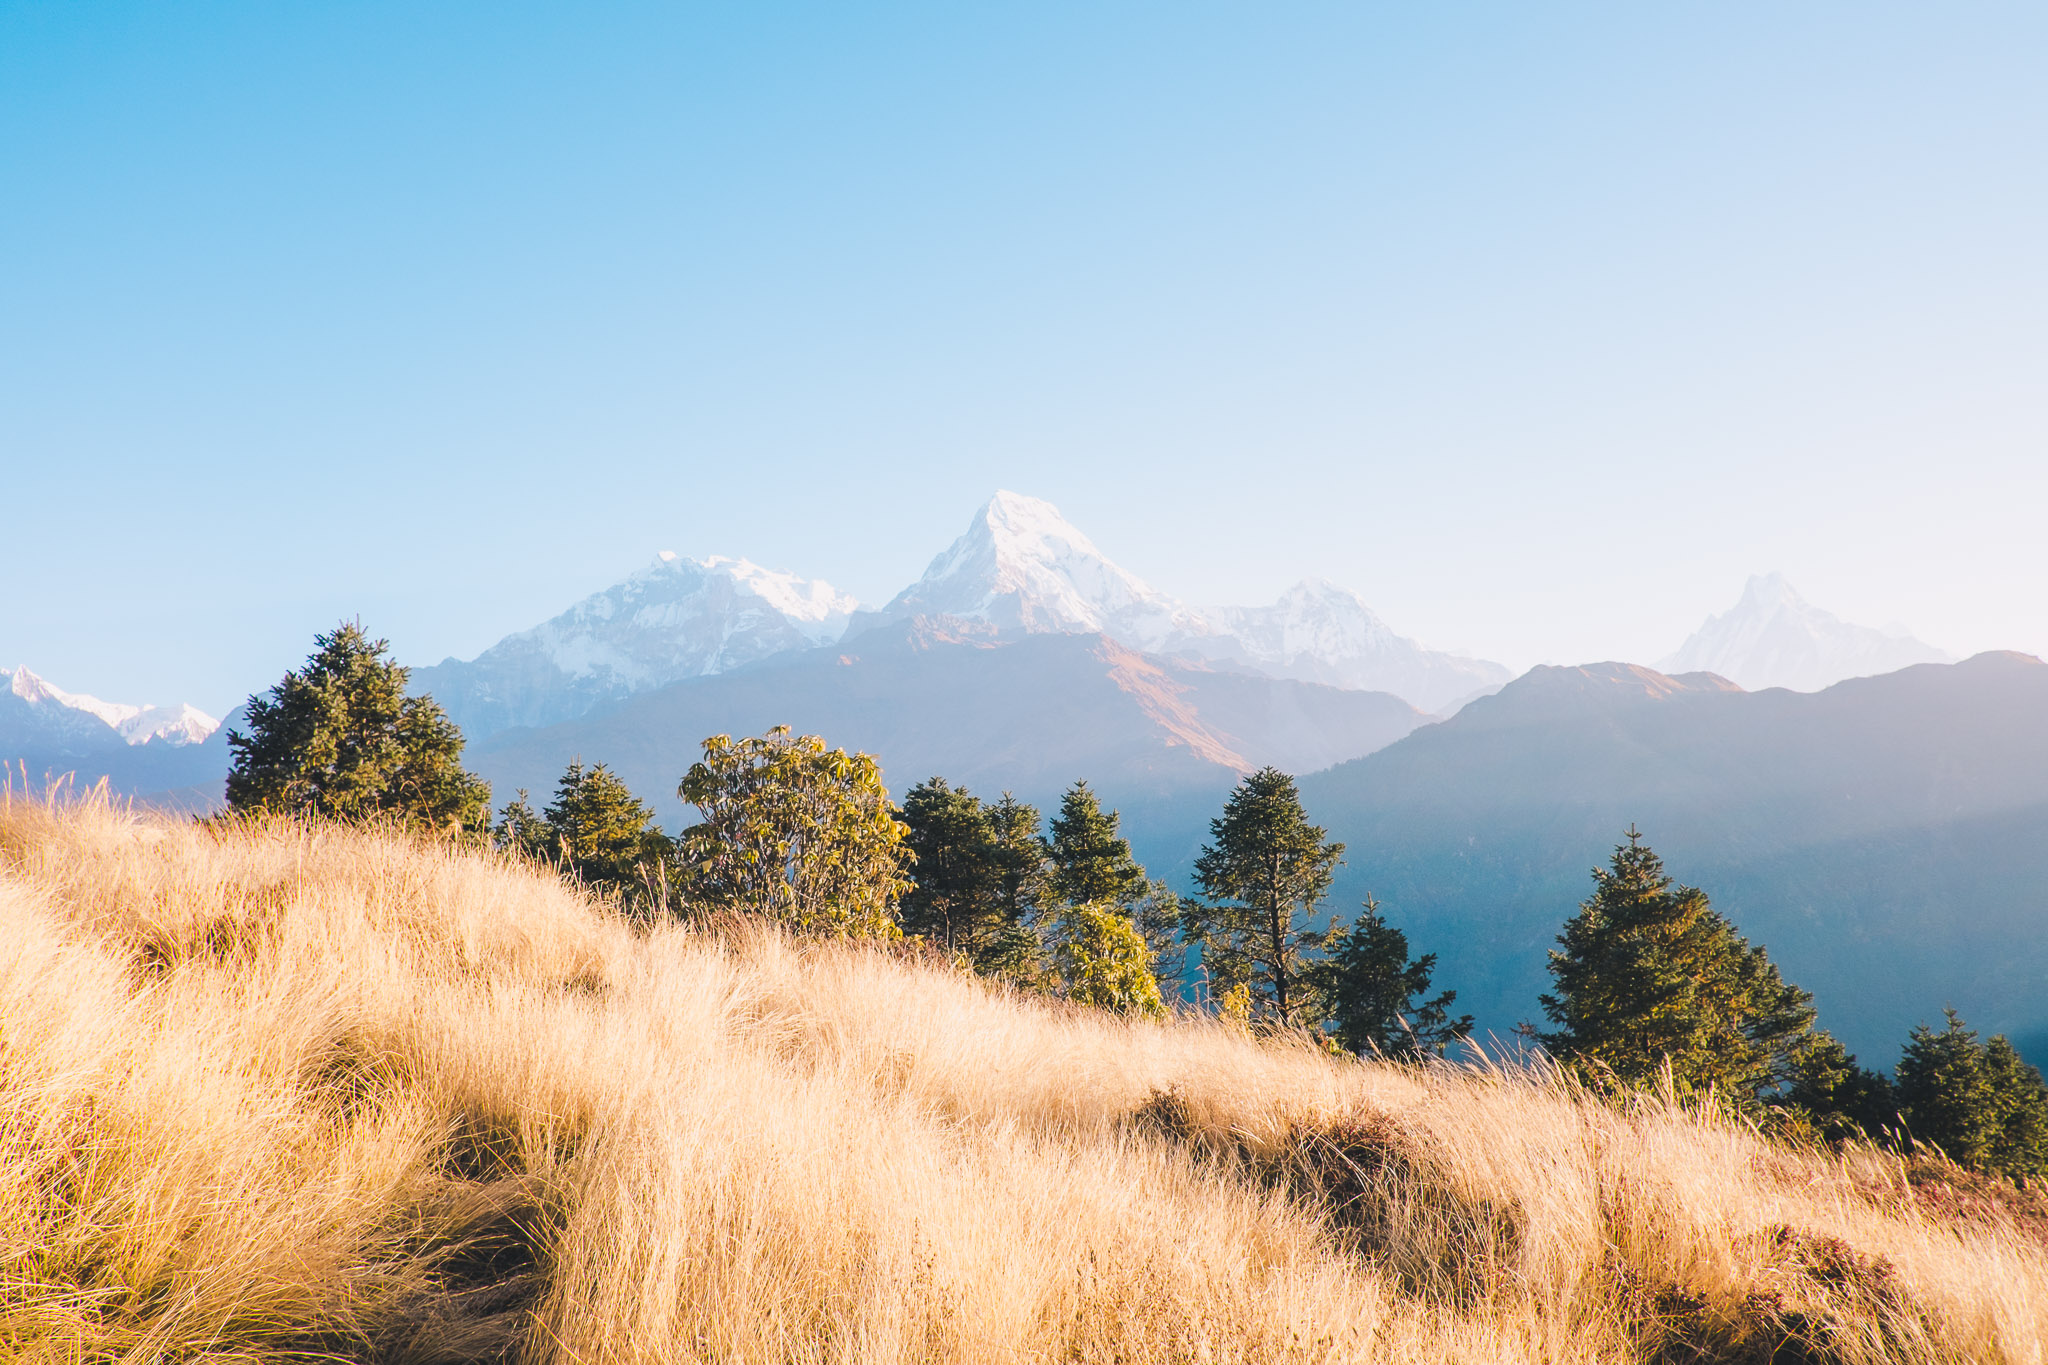 nepal-pokhara-ghorepani-poon-hill-mountain-teahouse-trek-26.jpg